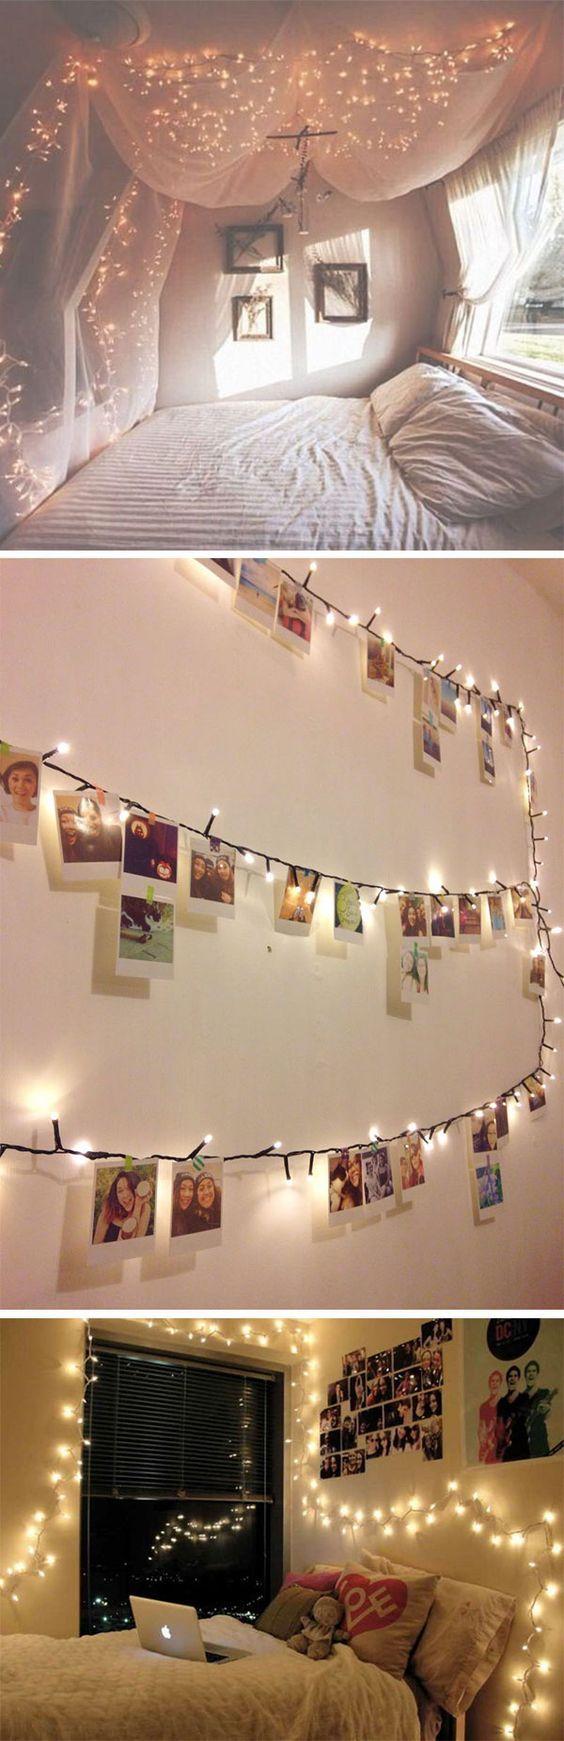 Teens bedroom decor bedroom fairy lightsfairy